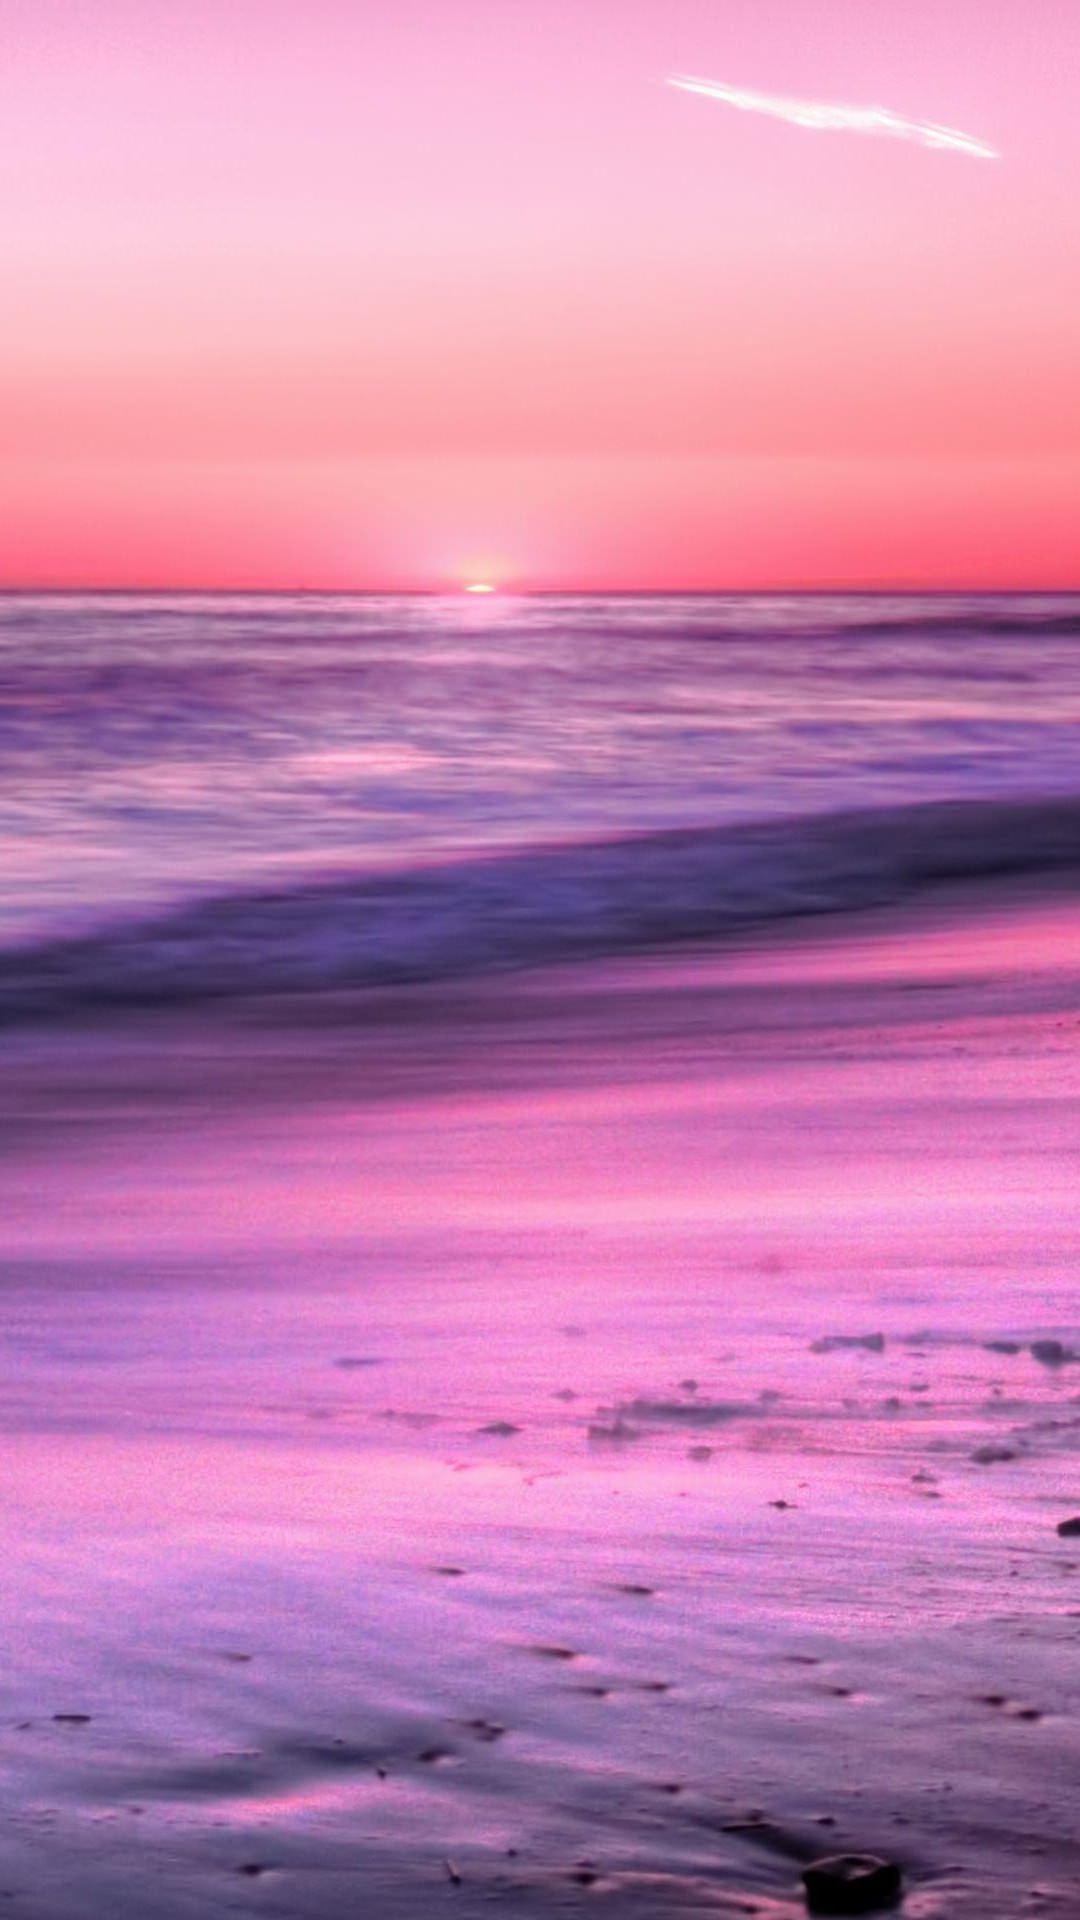 Pemandangan Laut Ungu Wallpapersc Android